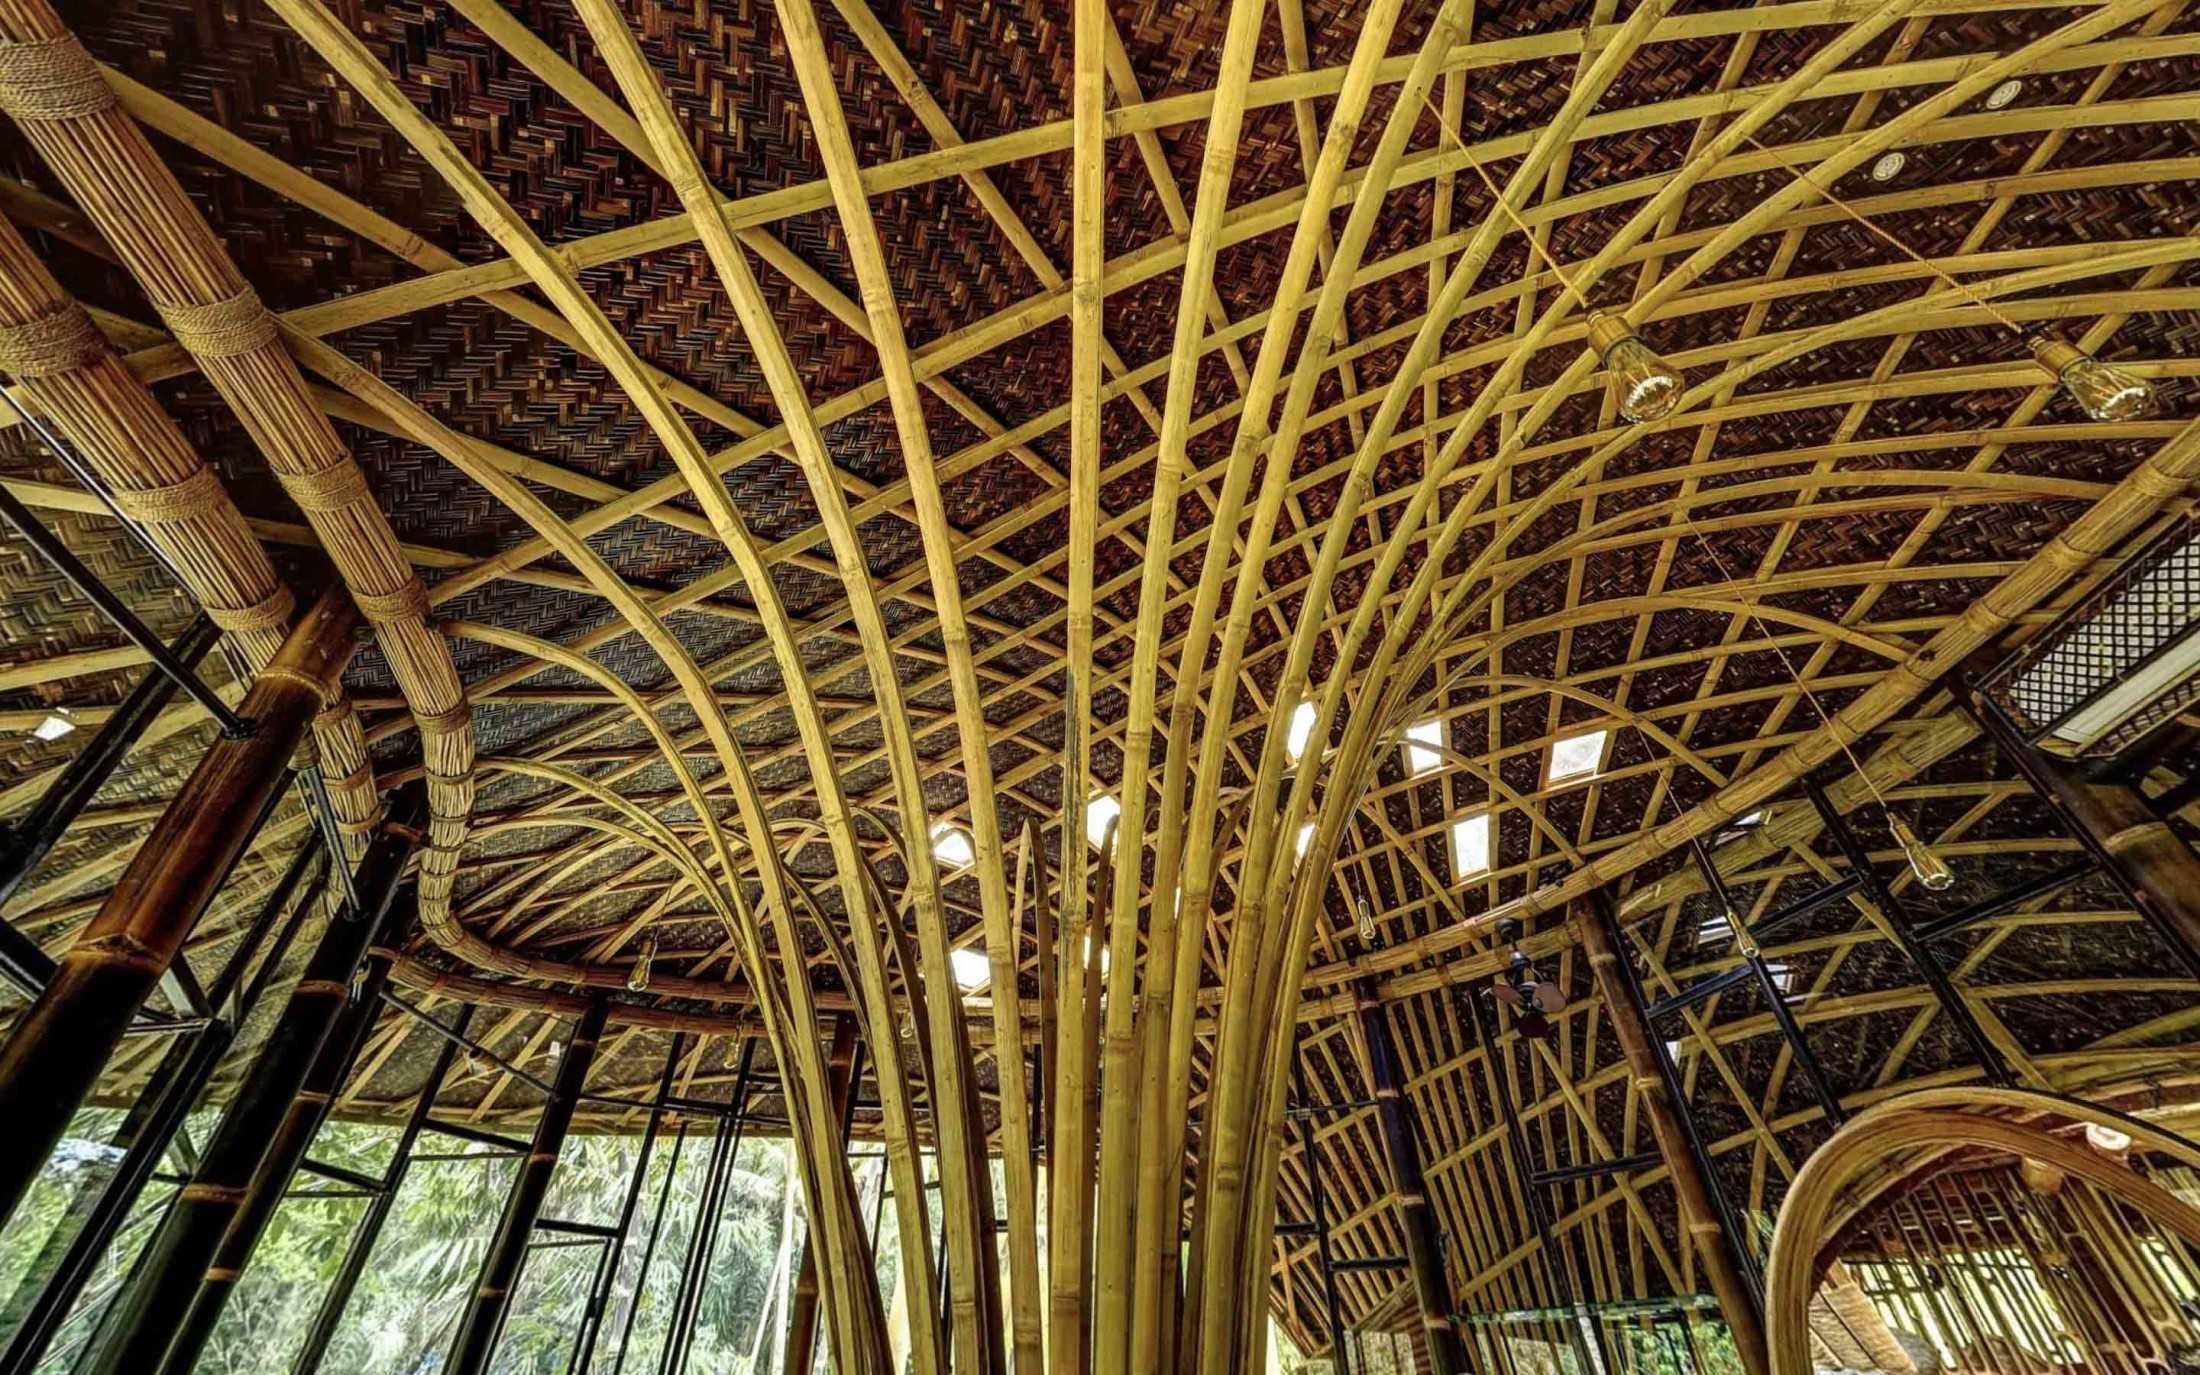 Agung Budi Raharsa | Architecture & Engineering Riverbend Bamboo House - Bali Bali, Indonesia Bali, Indonesia Agung-Budi-Raharsa-Riverbend-House-Bali  88718